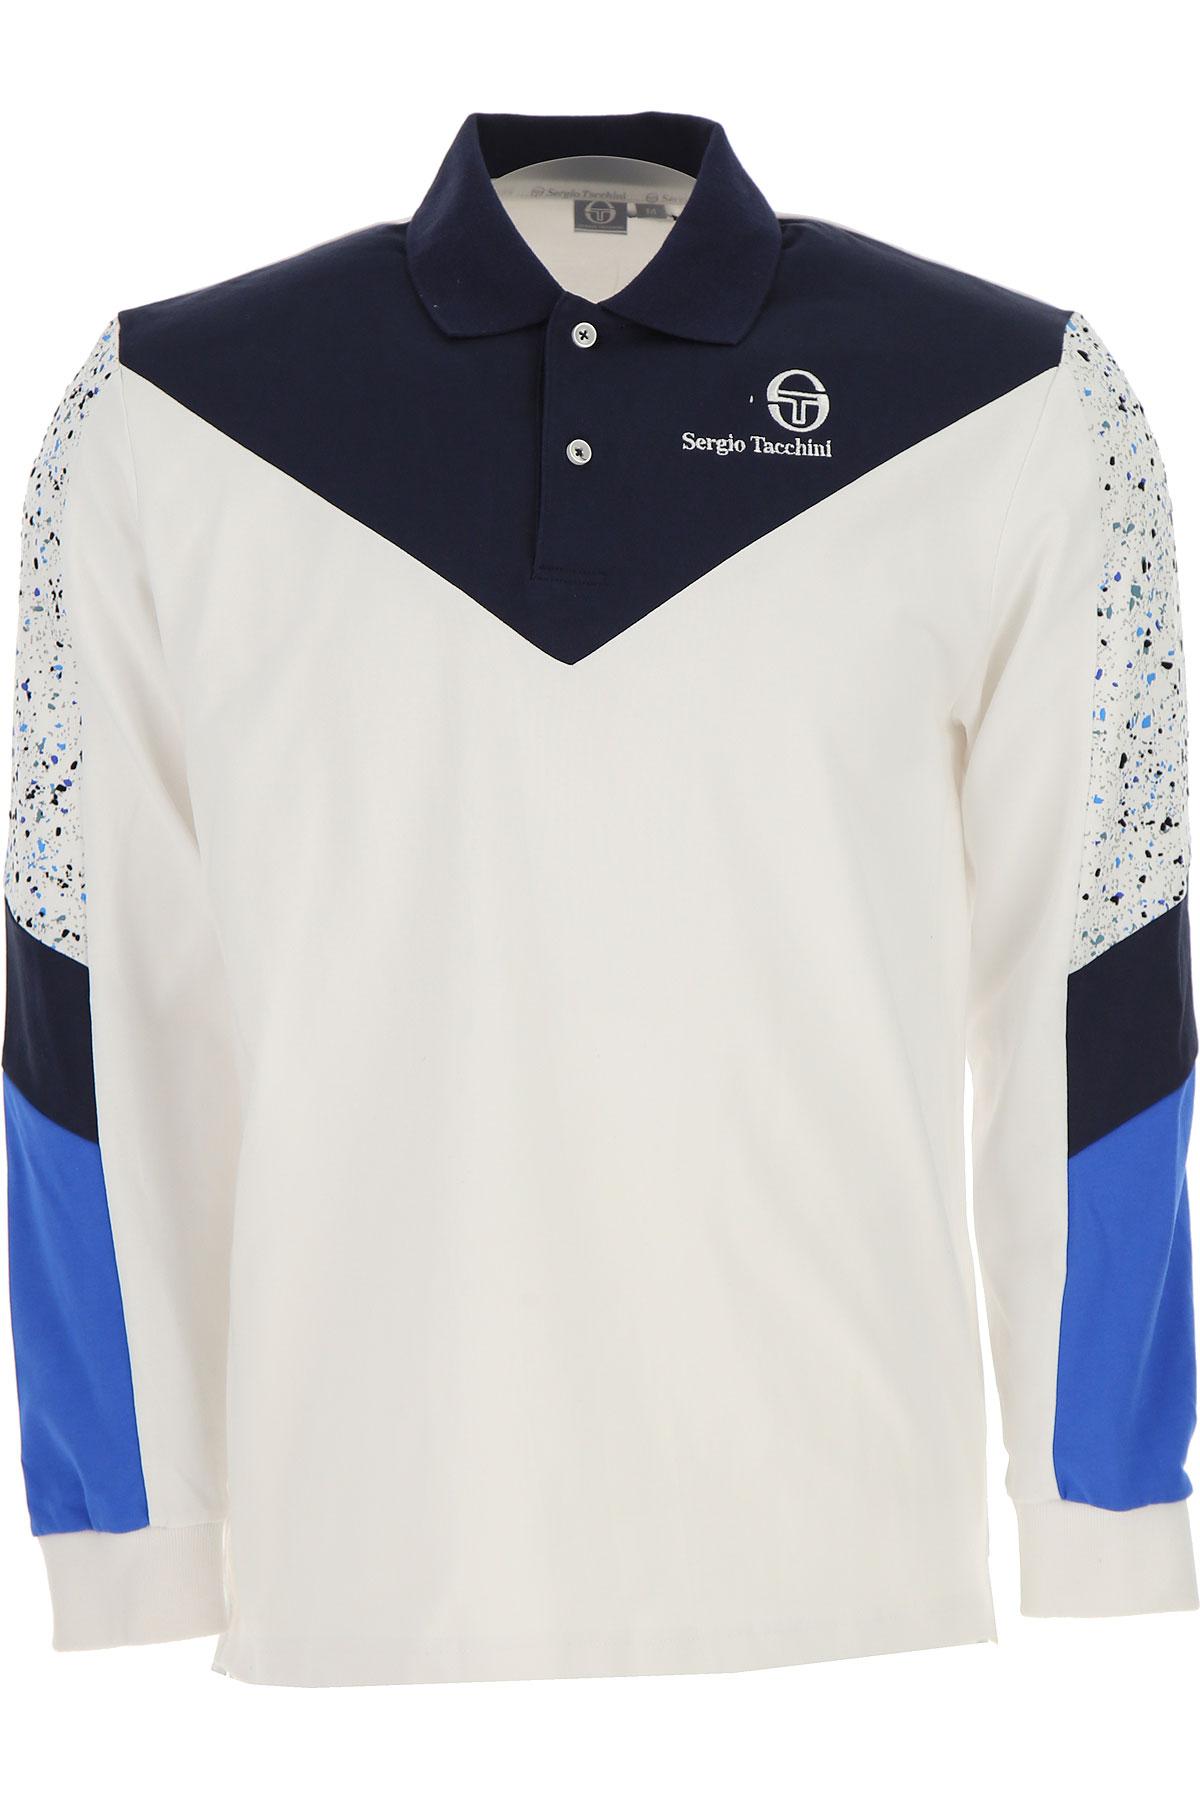 Image of Sergio Tacchini Polo Shirt for Men, White, Cotton, 2017, L M XL